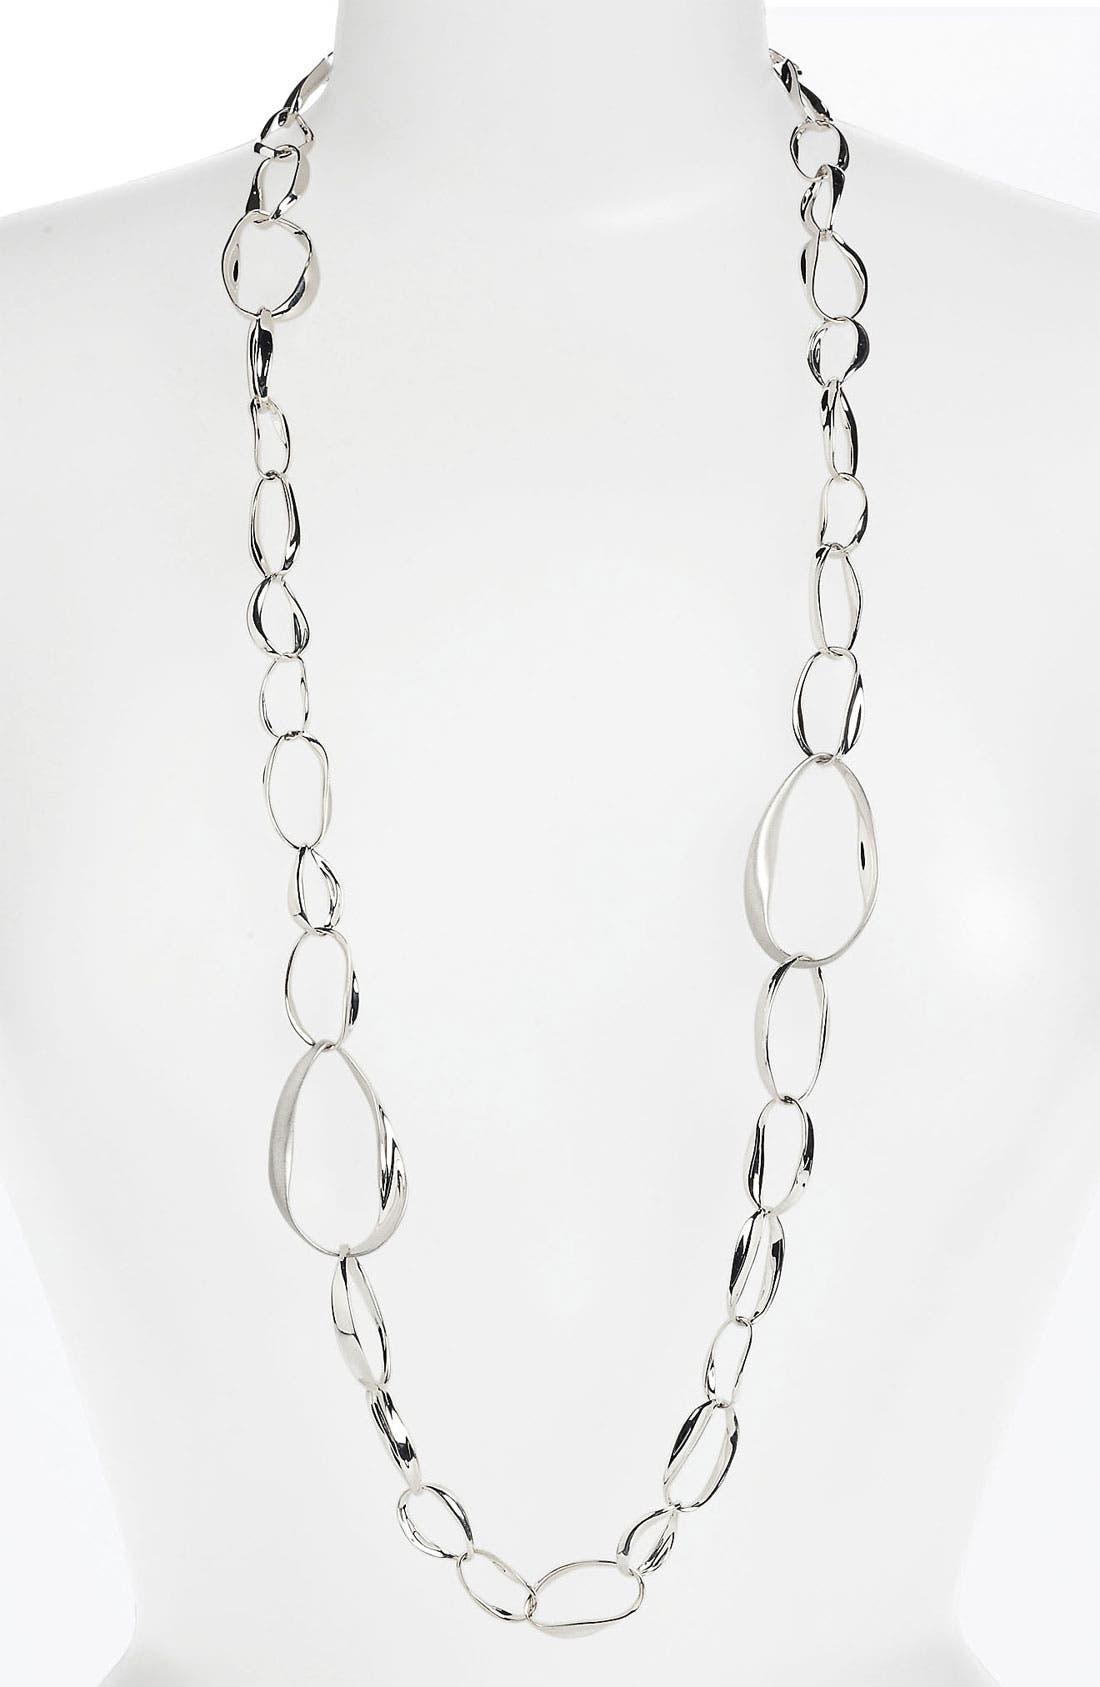 Alternate Image 1 Selected - Ippolita 'Venezia Links' Pear Shape Chain Necklace